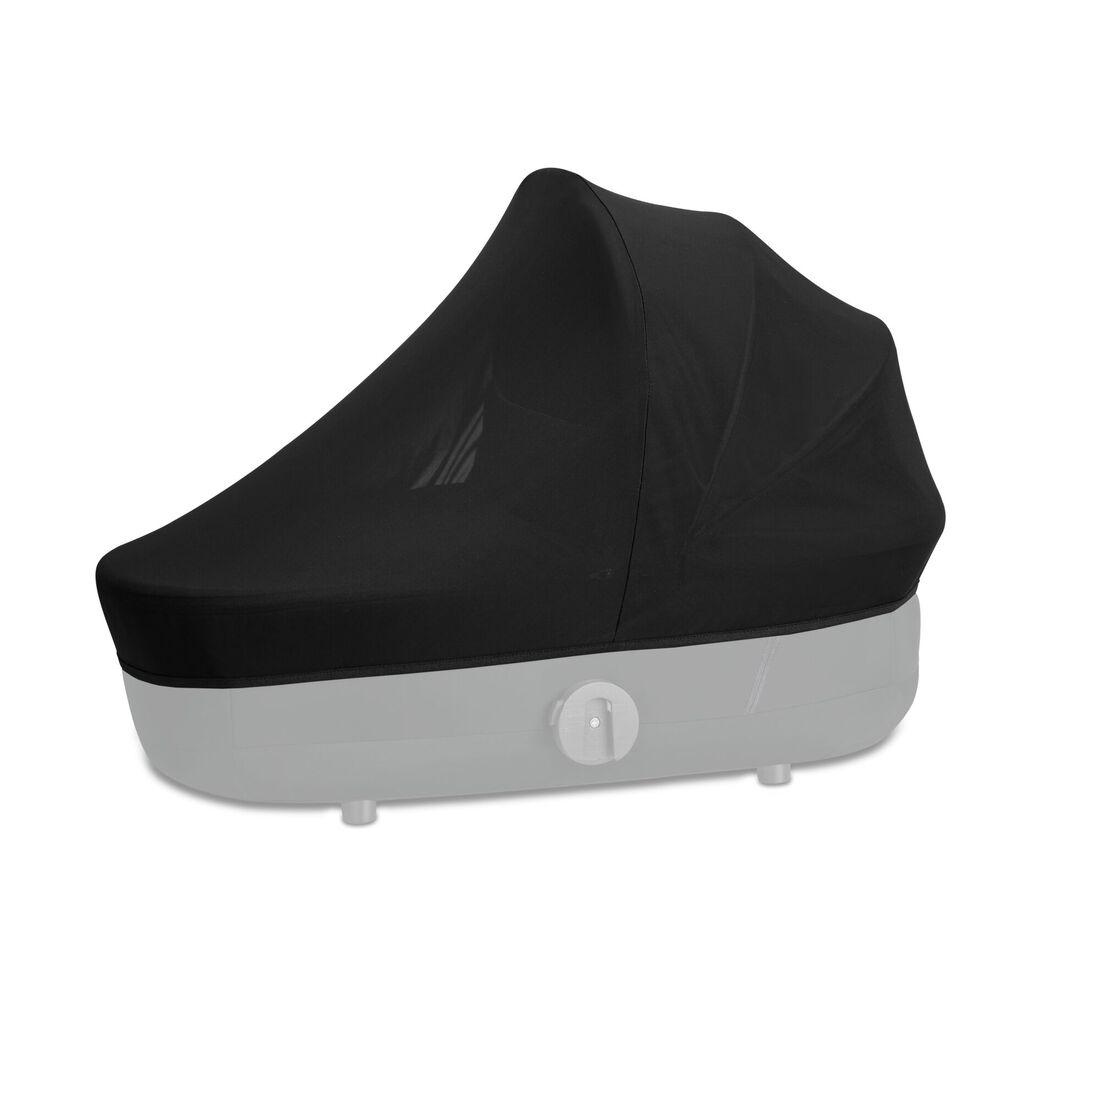 CYBEX Insektennetz Stroller Lux Carry Cots - Black in Black large Bild 2